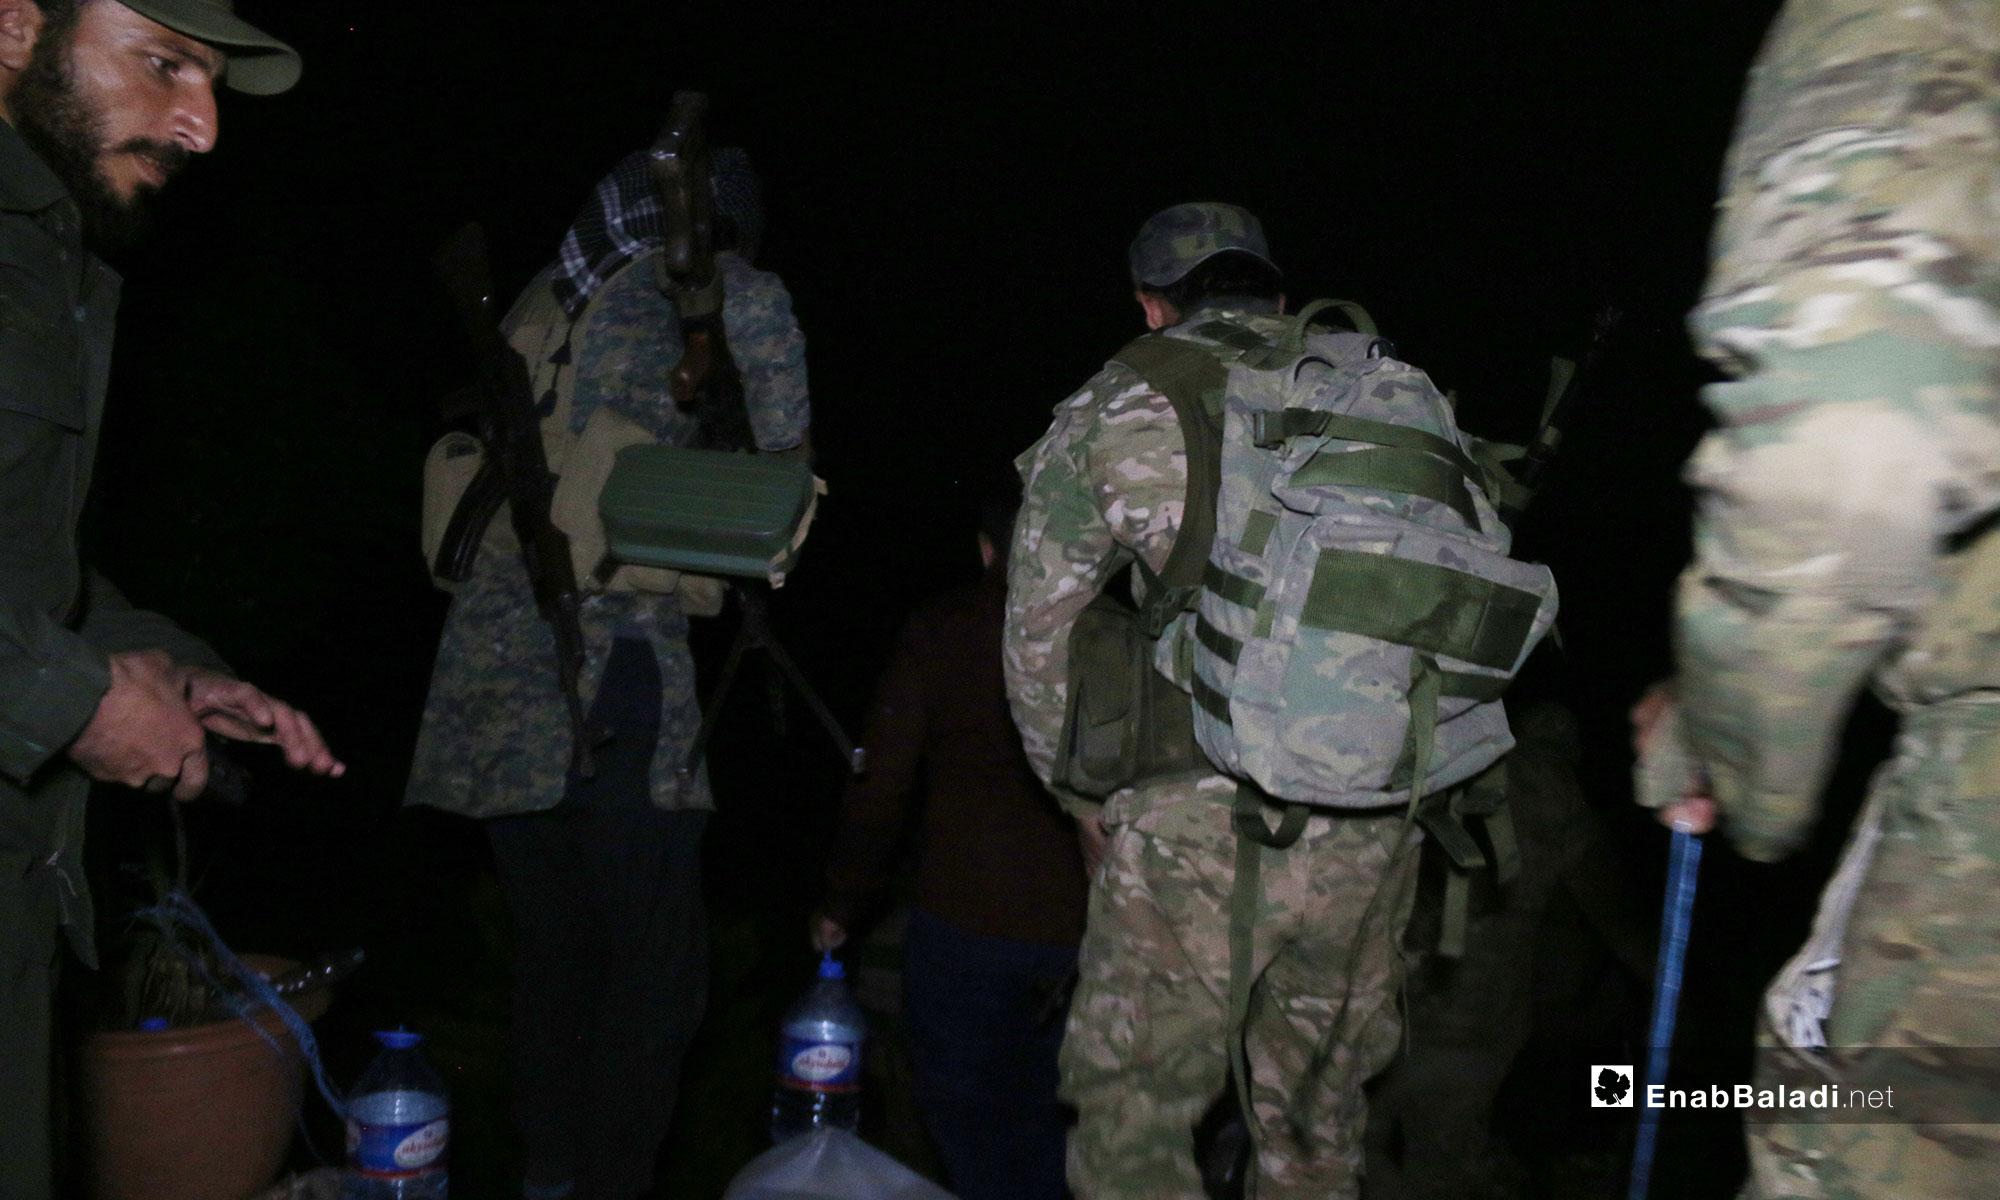 Opposition factions move towards rural Hama's fronts – May 26, 2019 (Enab Baladi)